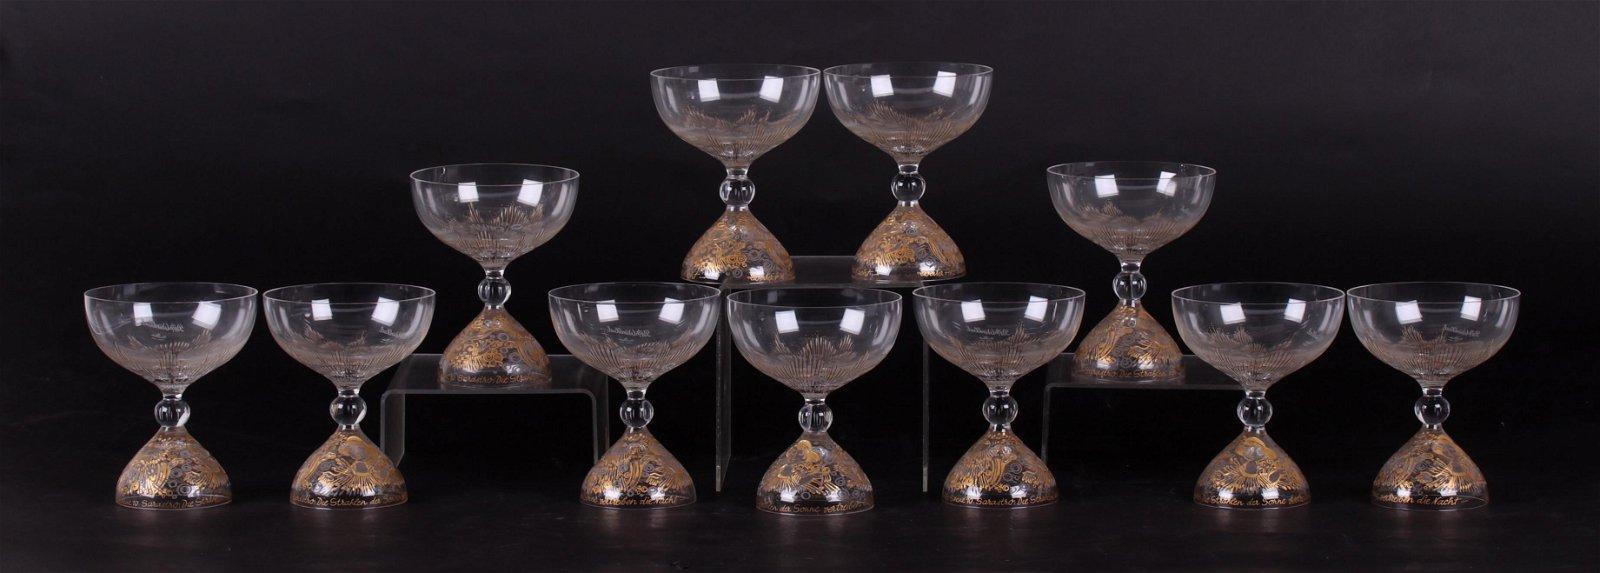 Bjorn Wiinblad, Rosenthal, Magic Flute Champagnes